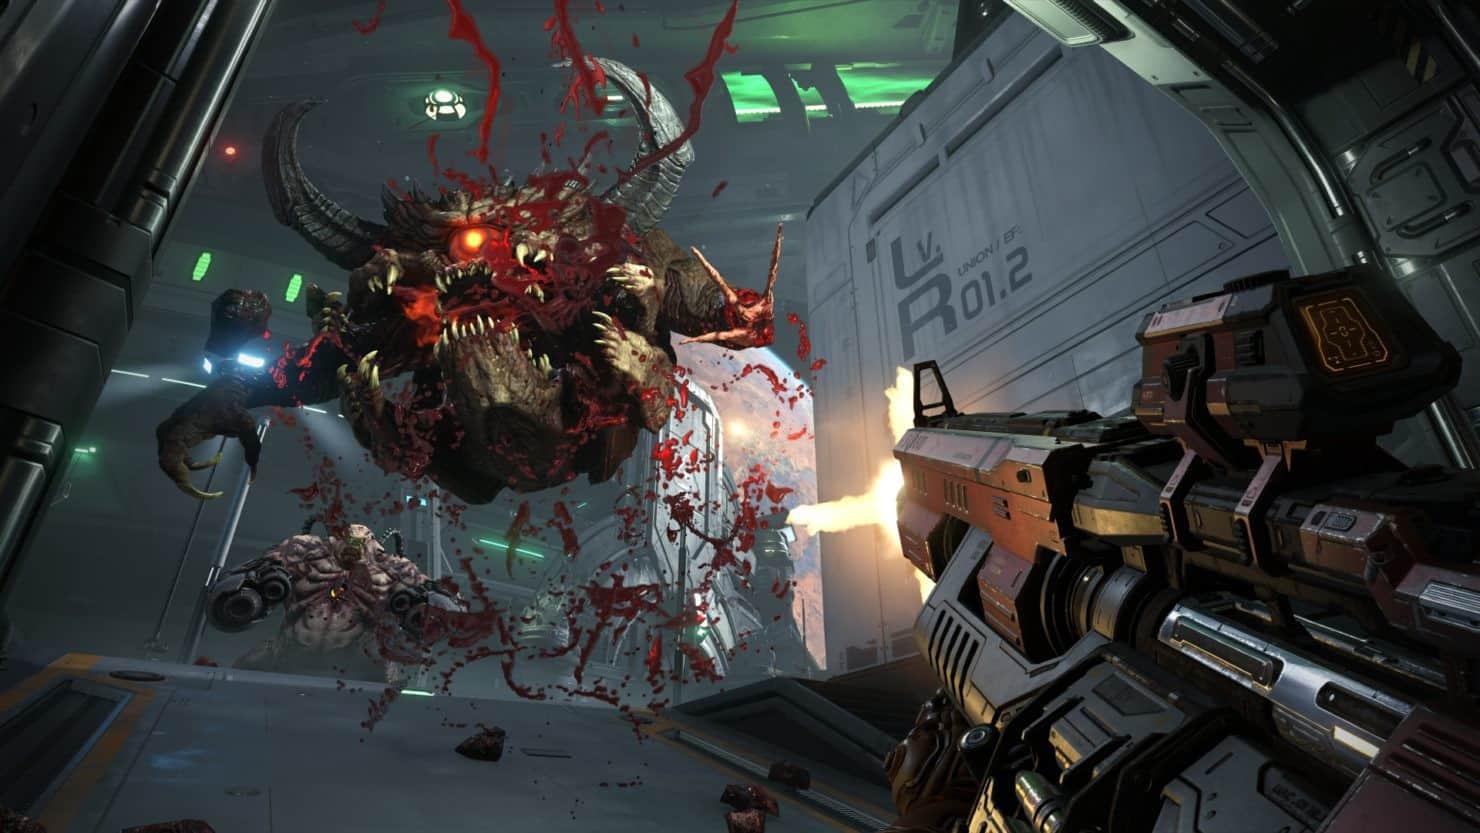 doom eternal 3 - DOOM Eternal - Primi dettagli, Immagini e gameplay